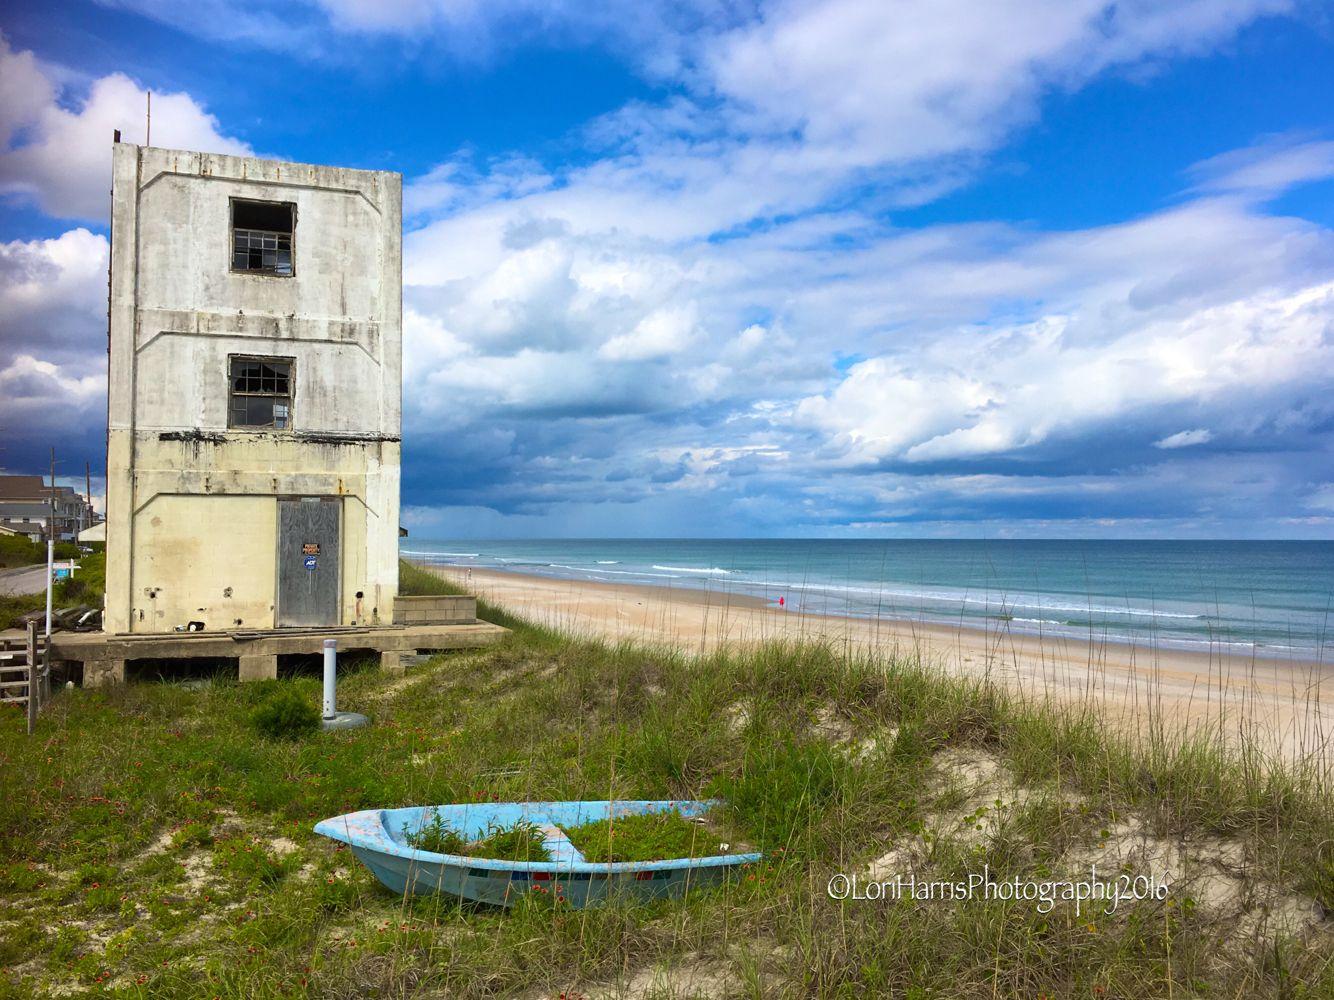 Topsail Blue III #LoriHarrisPhotography